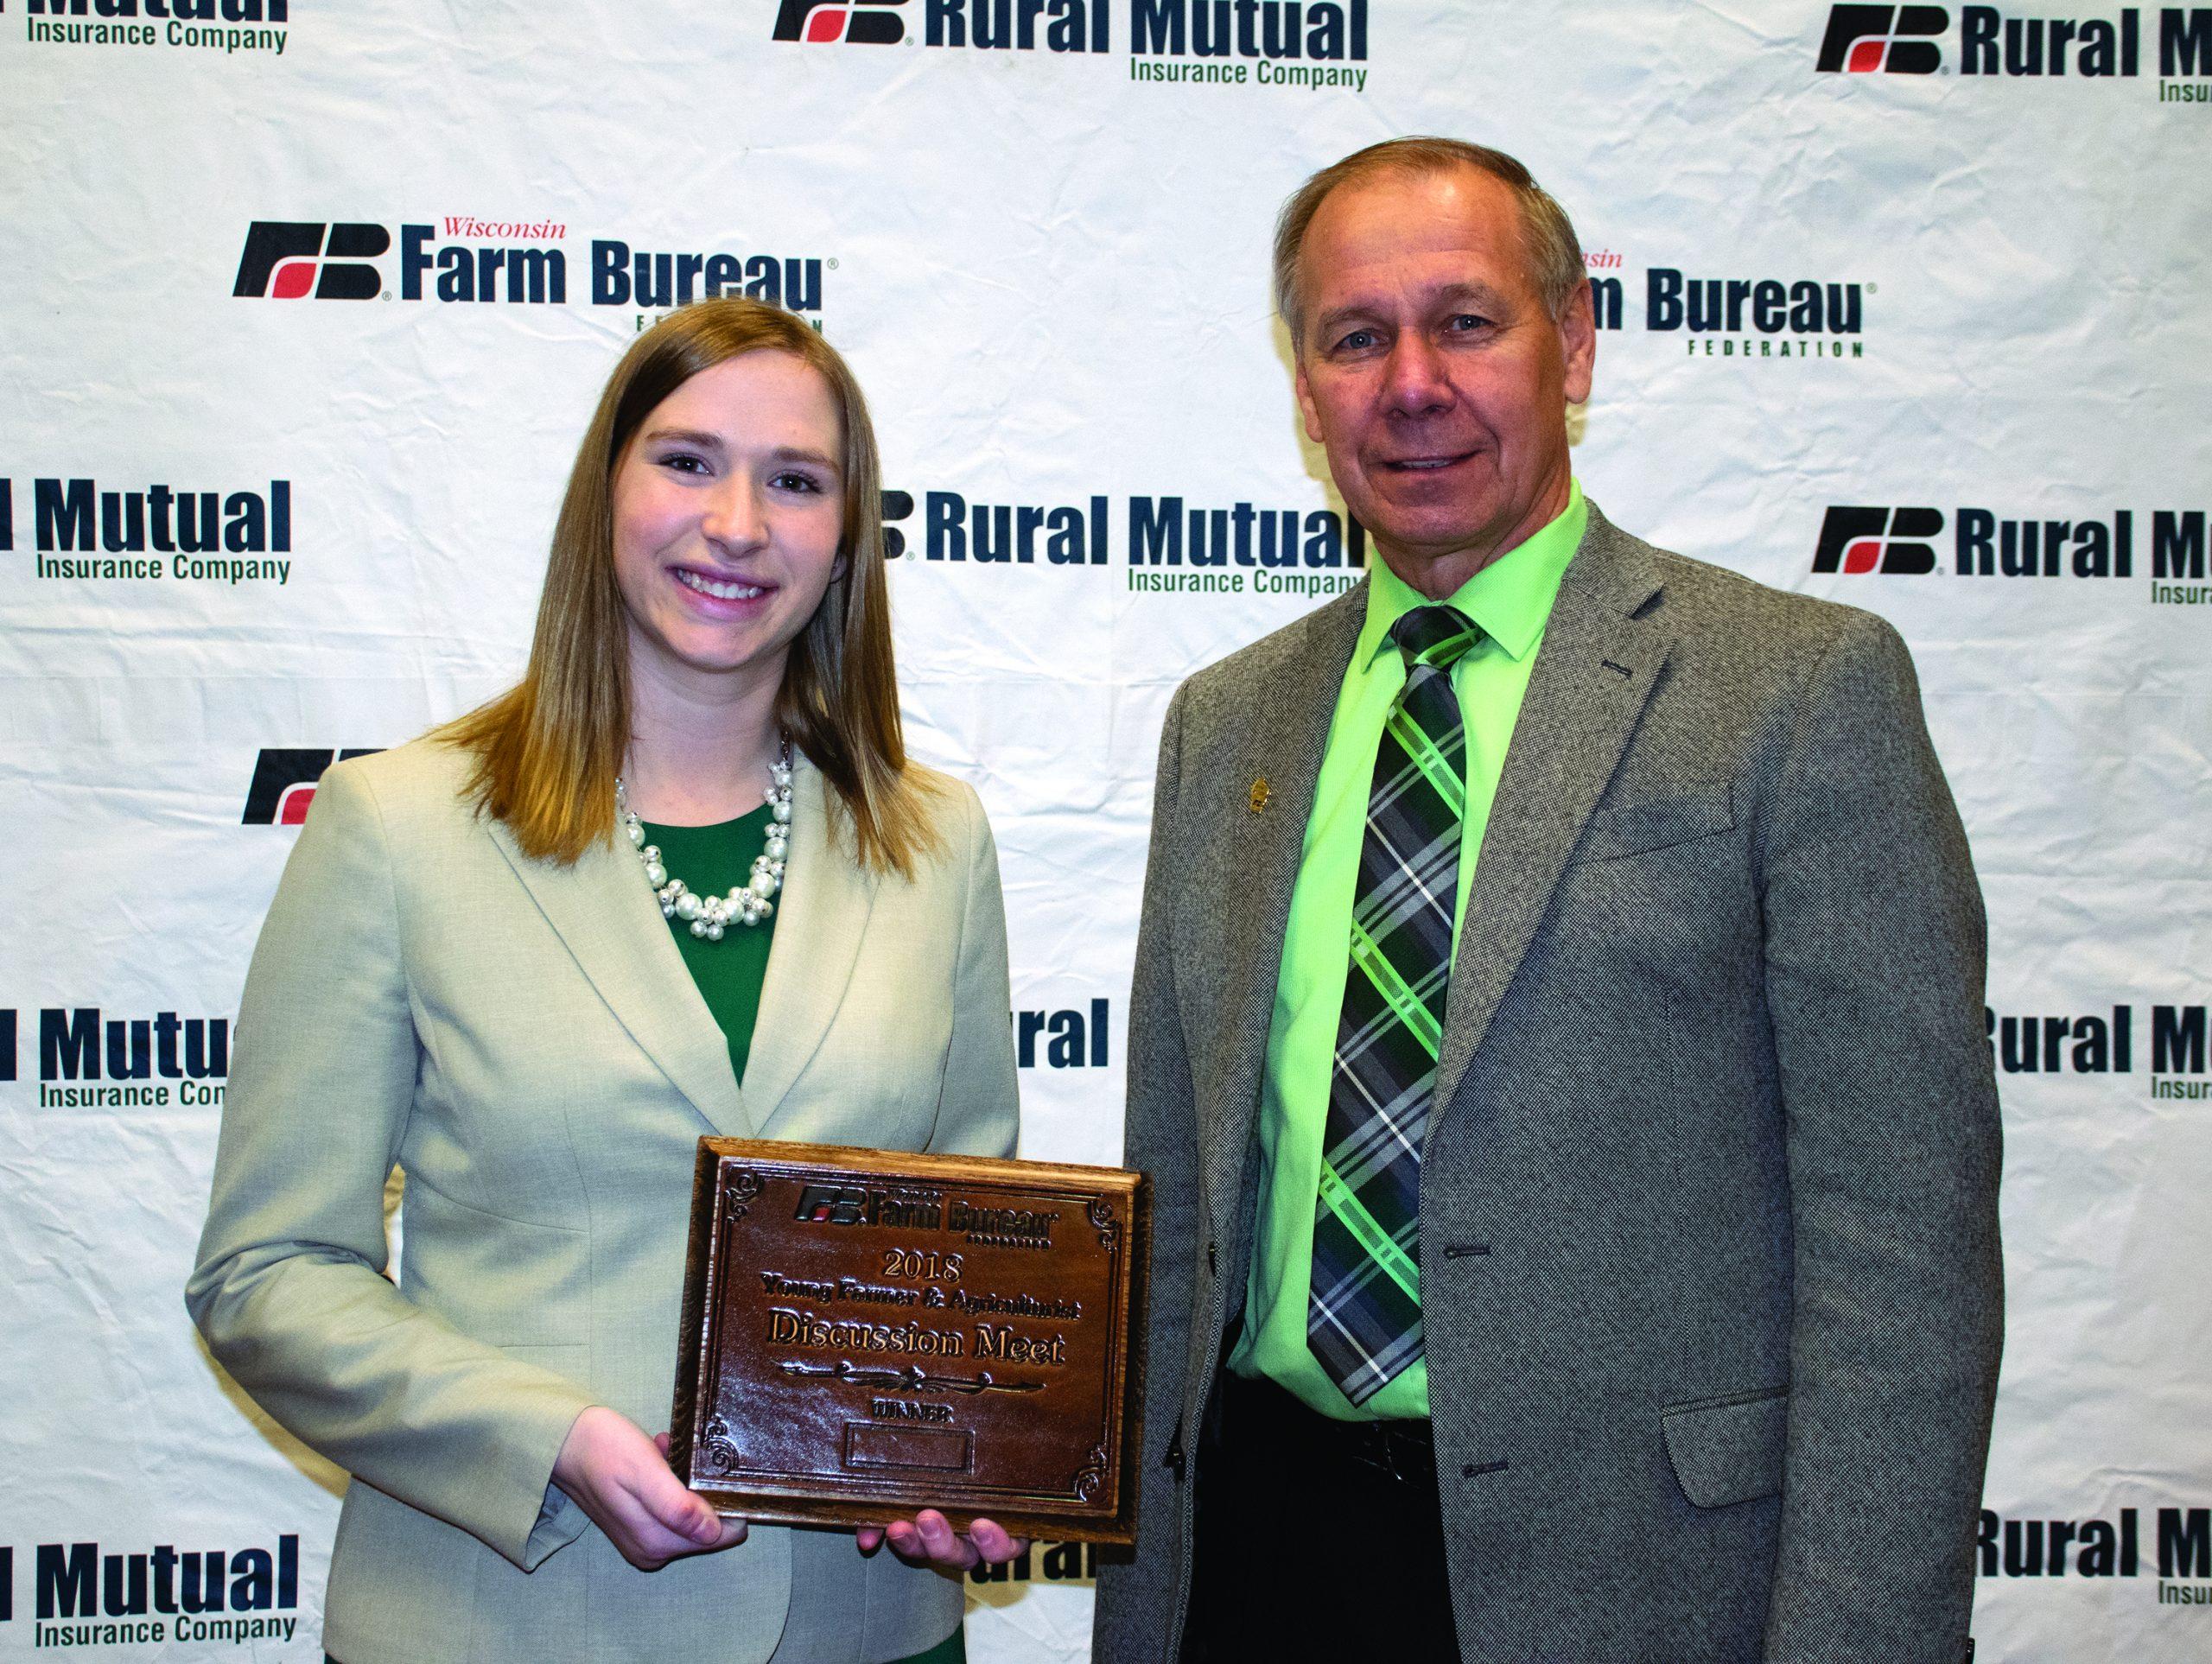 Manitowoc County Woman Wins Farm Bureau's Discussion Meet Contest